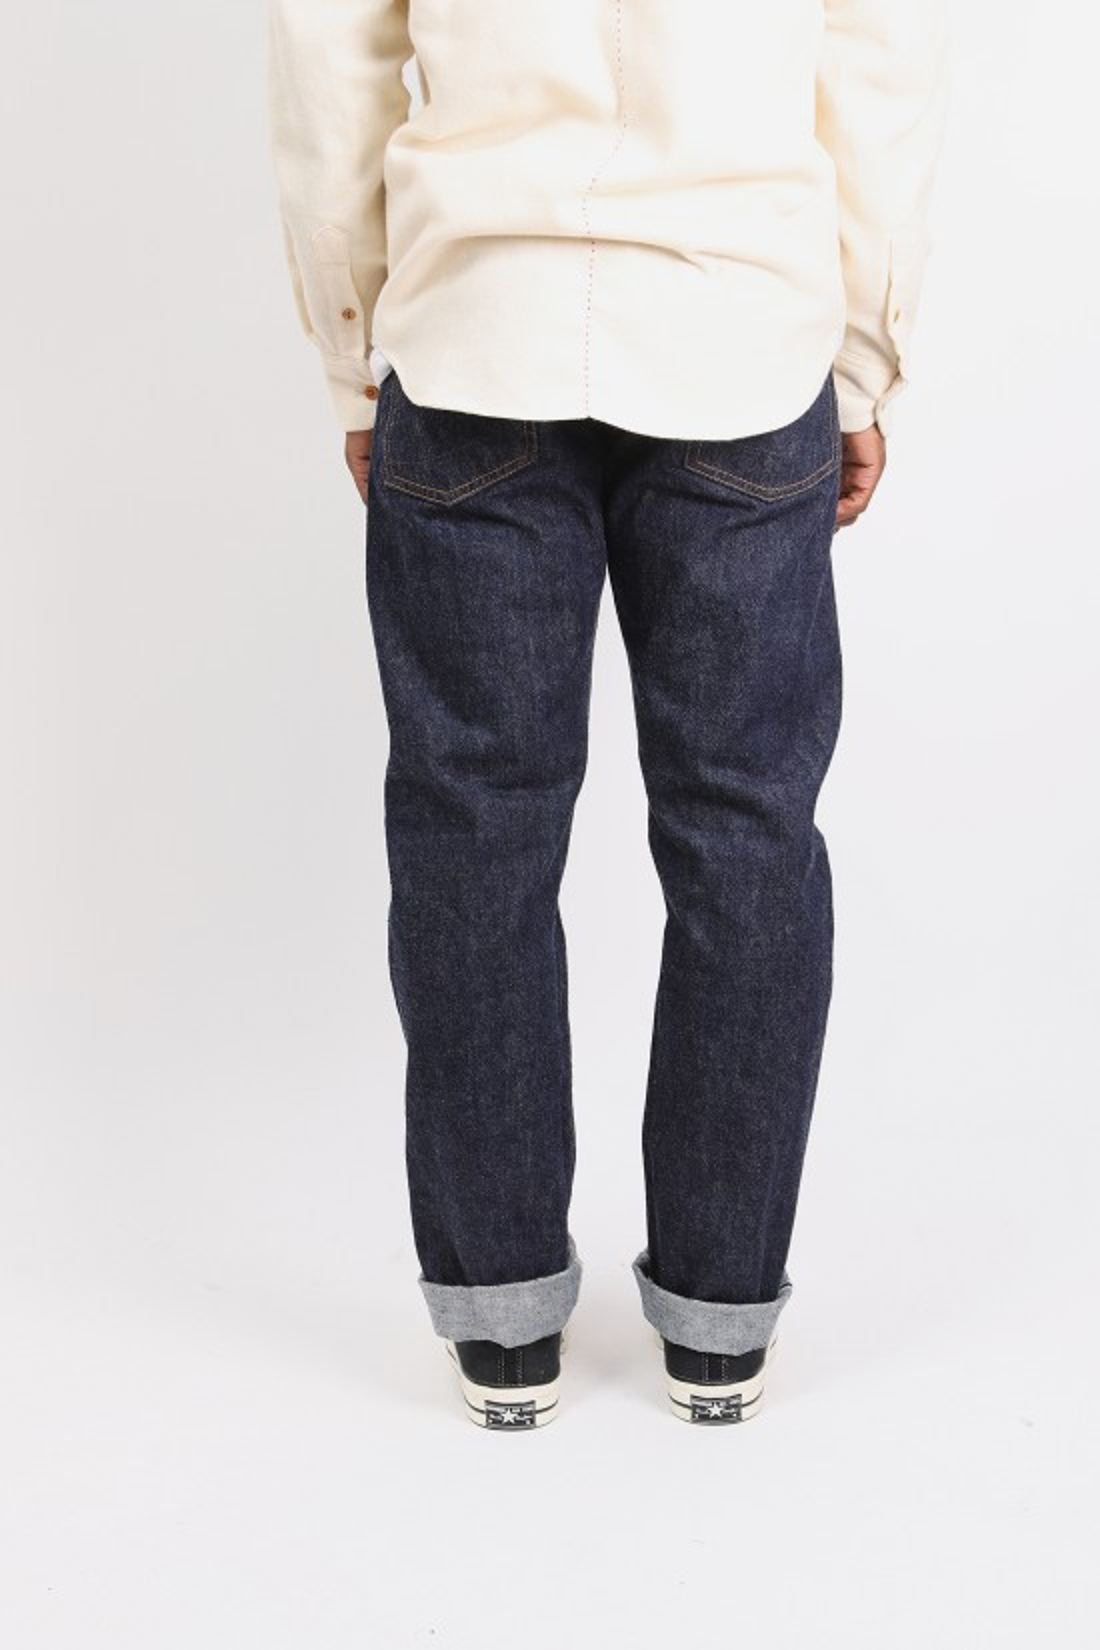 ORSLOW / 105 standard jean denim One wash